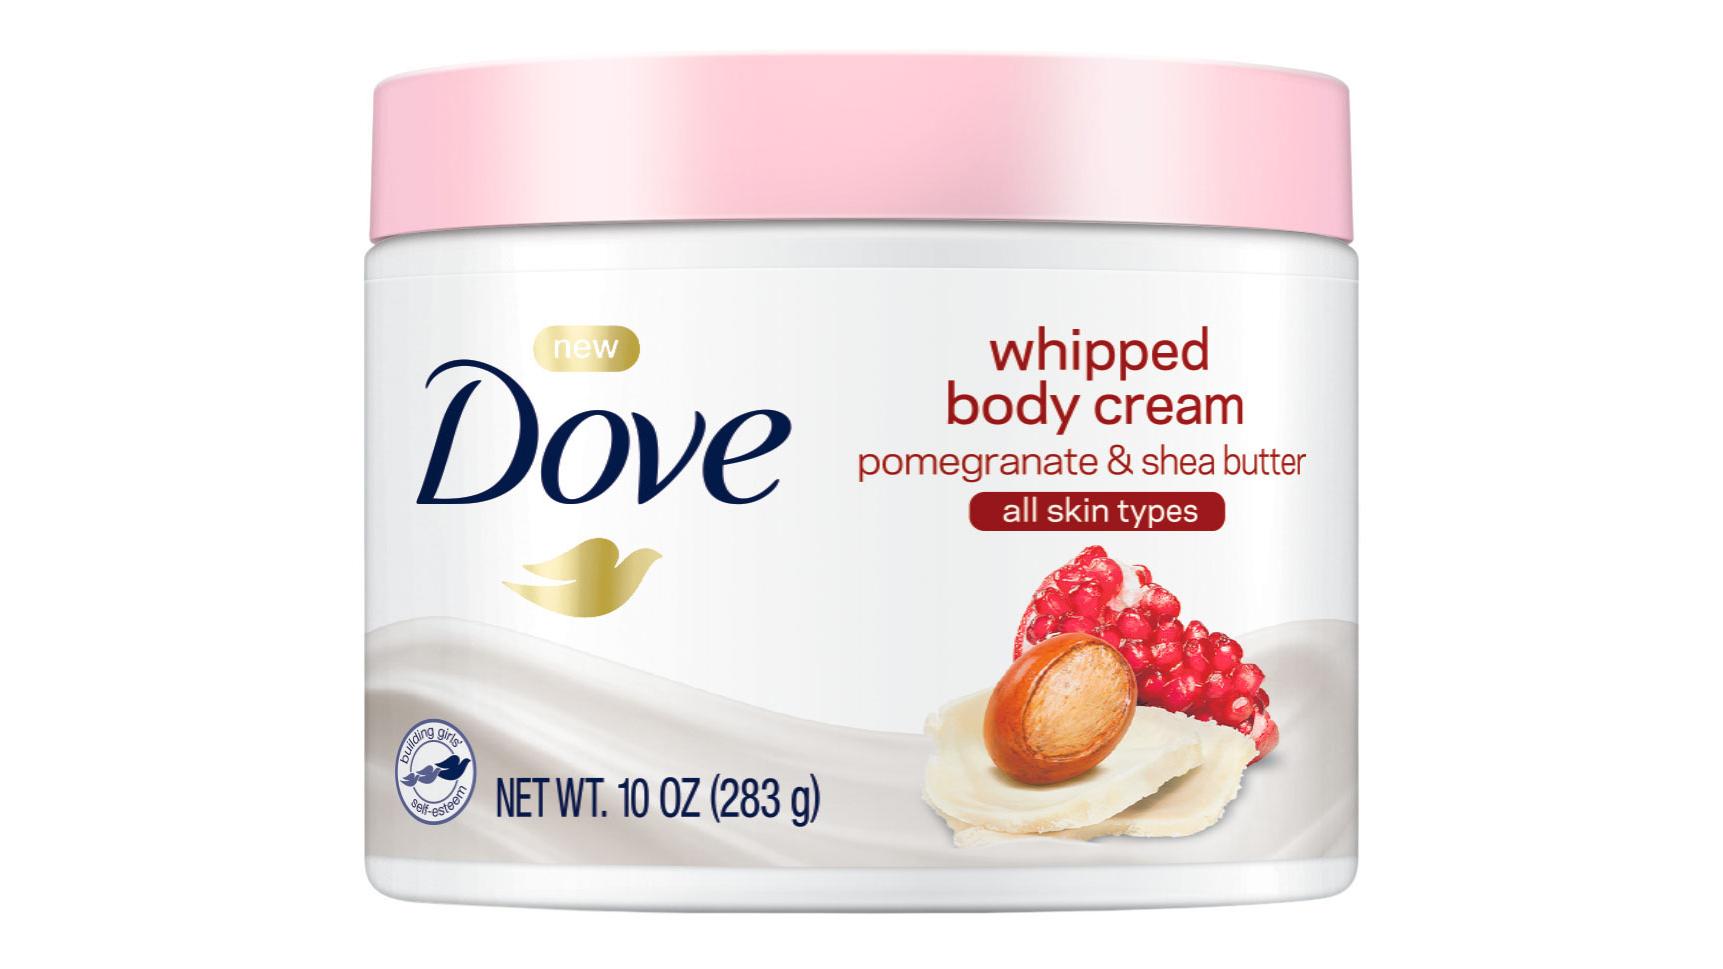 dove whipped body cream all skin